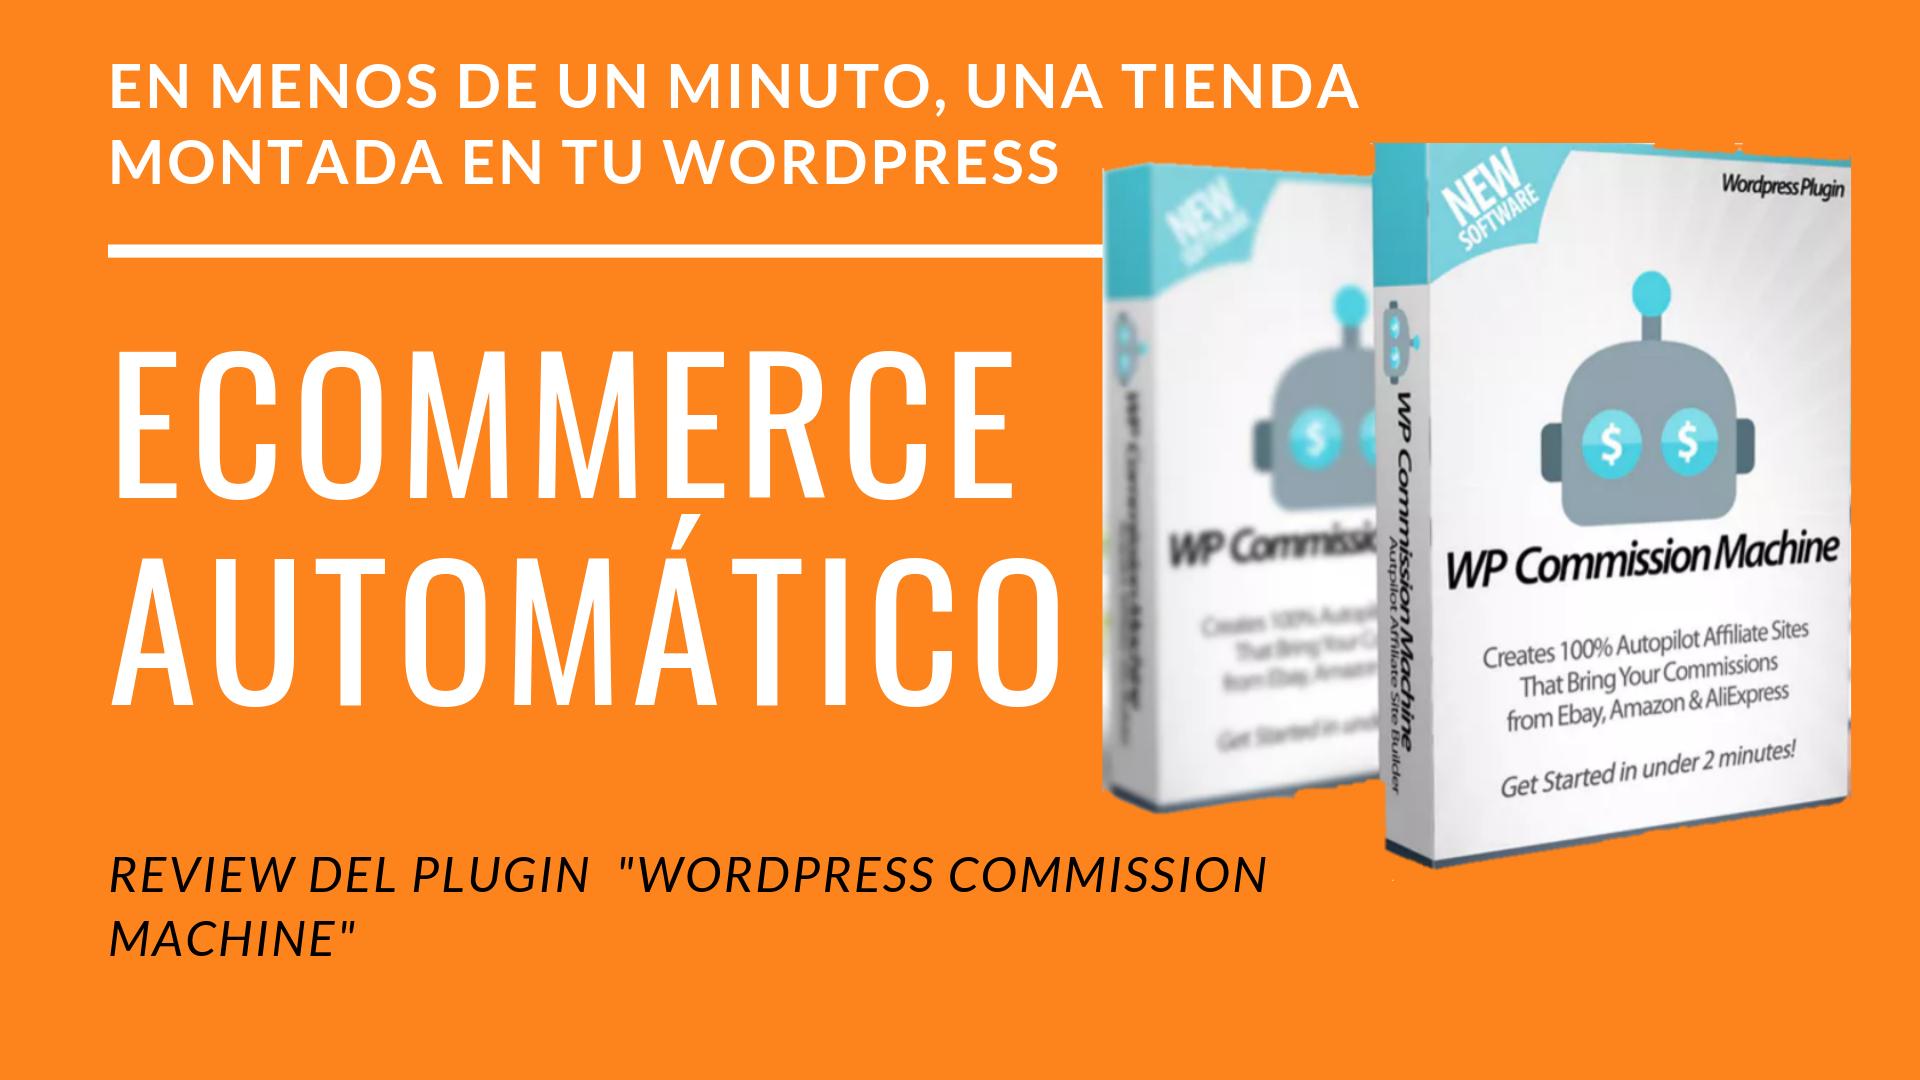 Review de » WordPress Commission machine»   Plugin de Ingresos pasivos con  Aliexpress, eBay y Amazon.